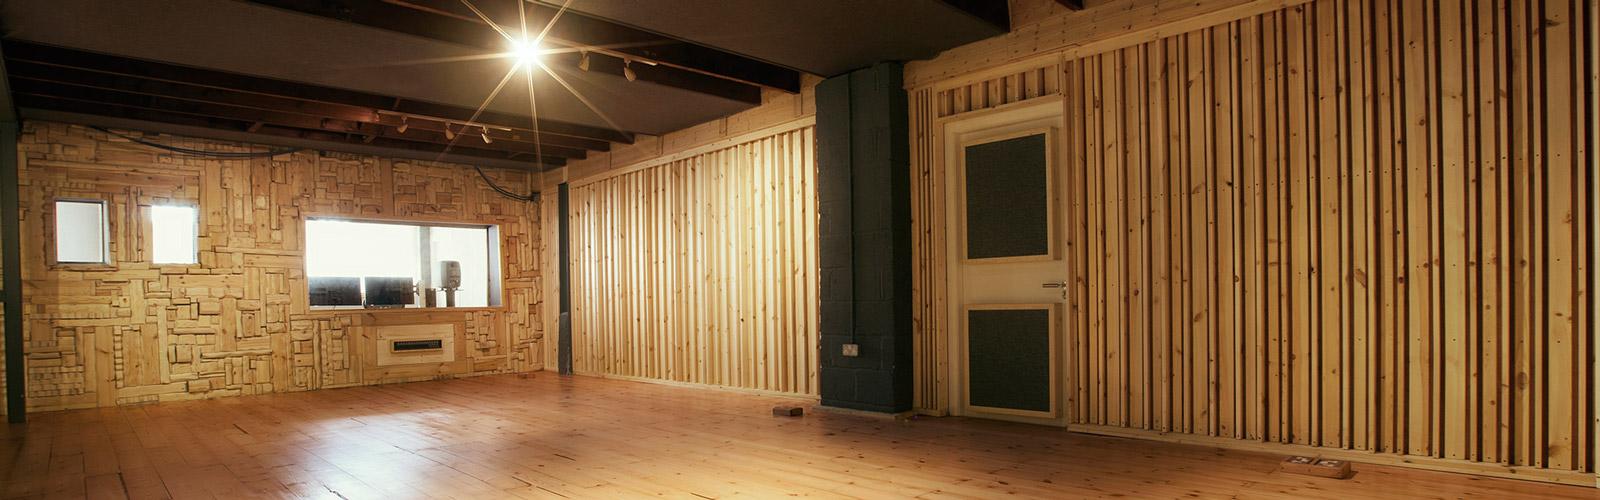 Loft Music Studios - Live Room 3